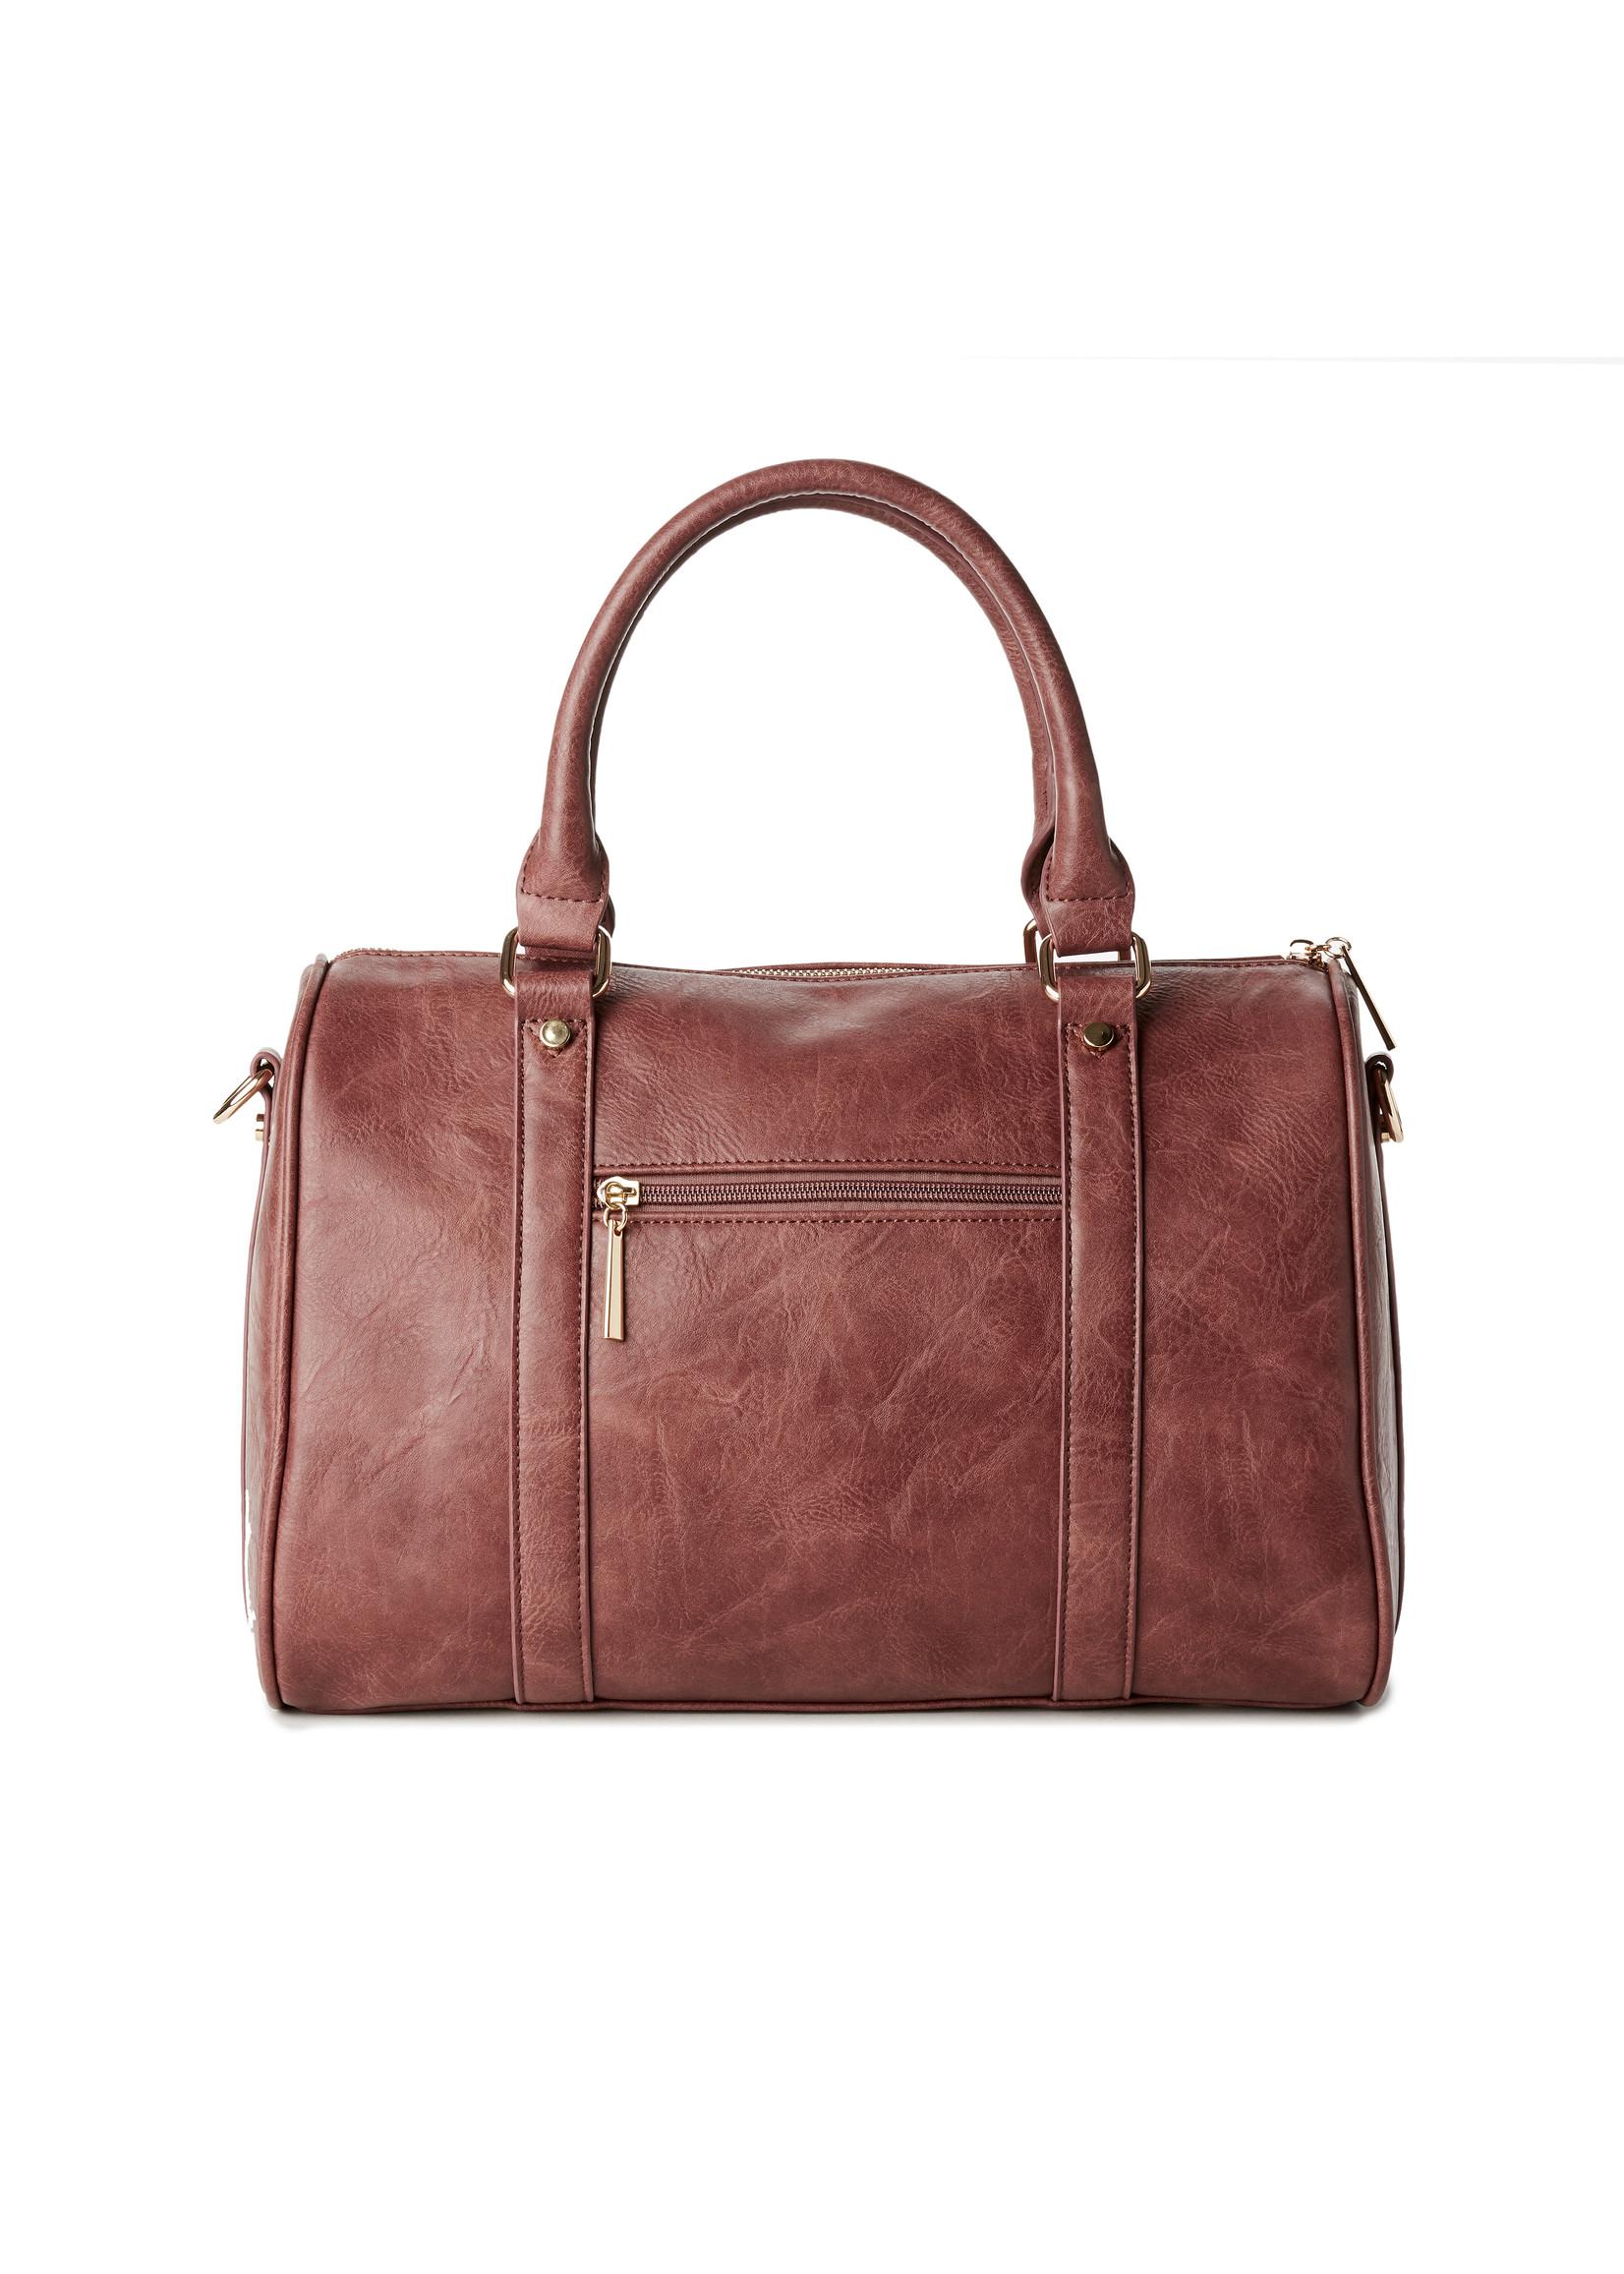 Jeane&Jax London - Bowler Bag